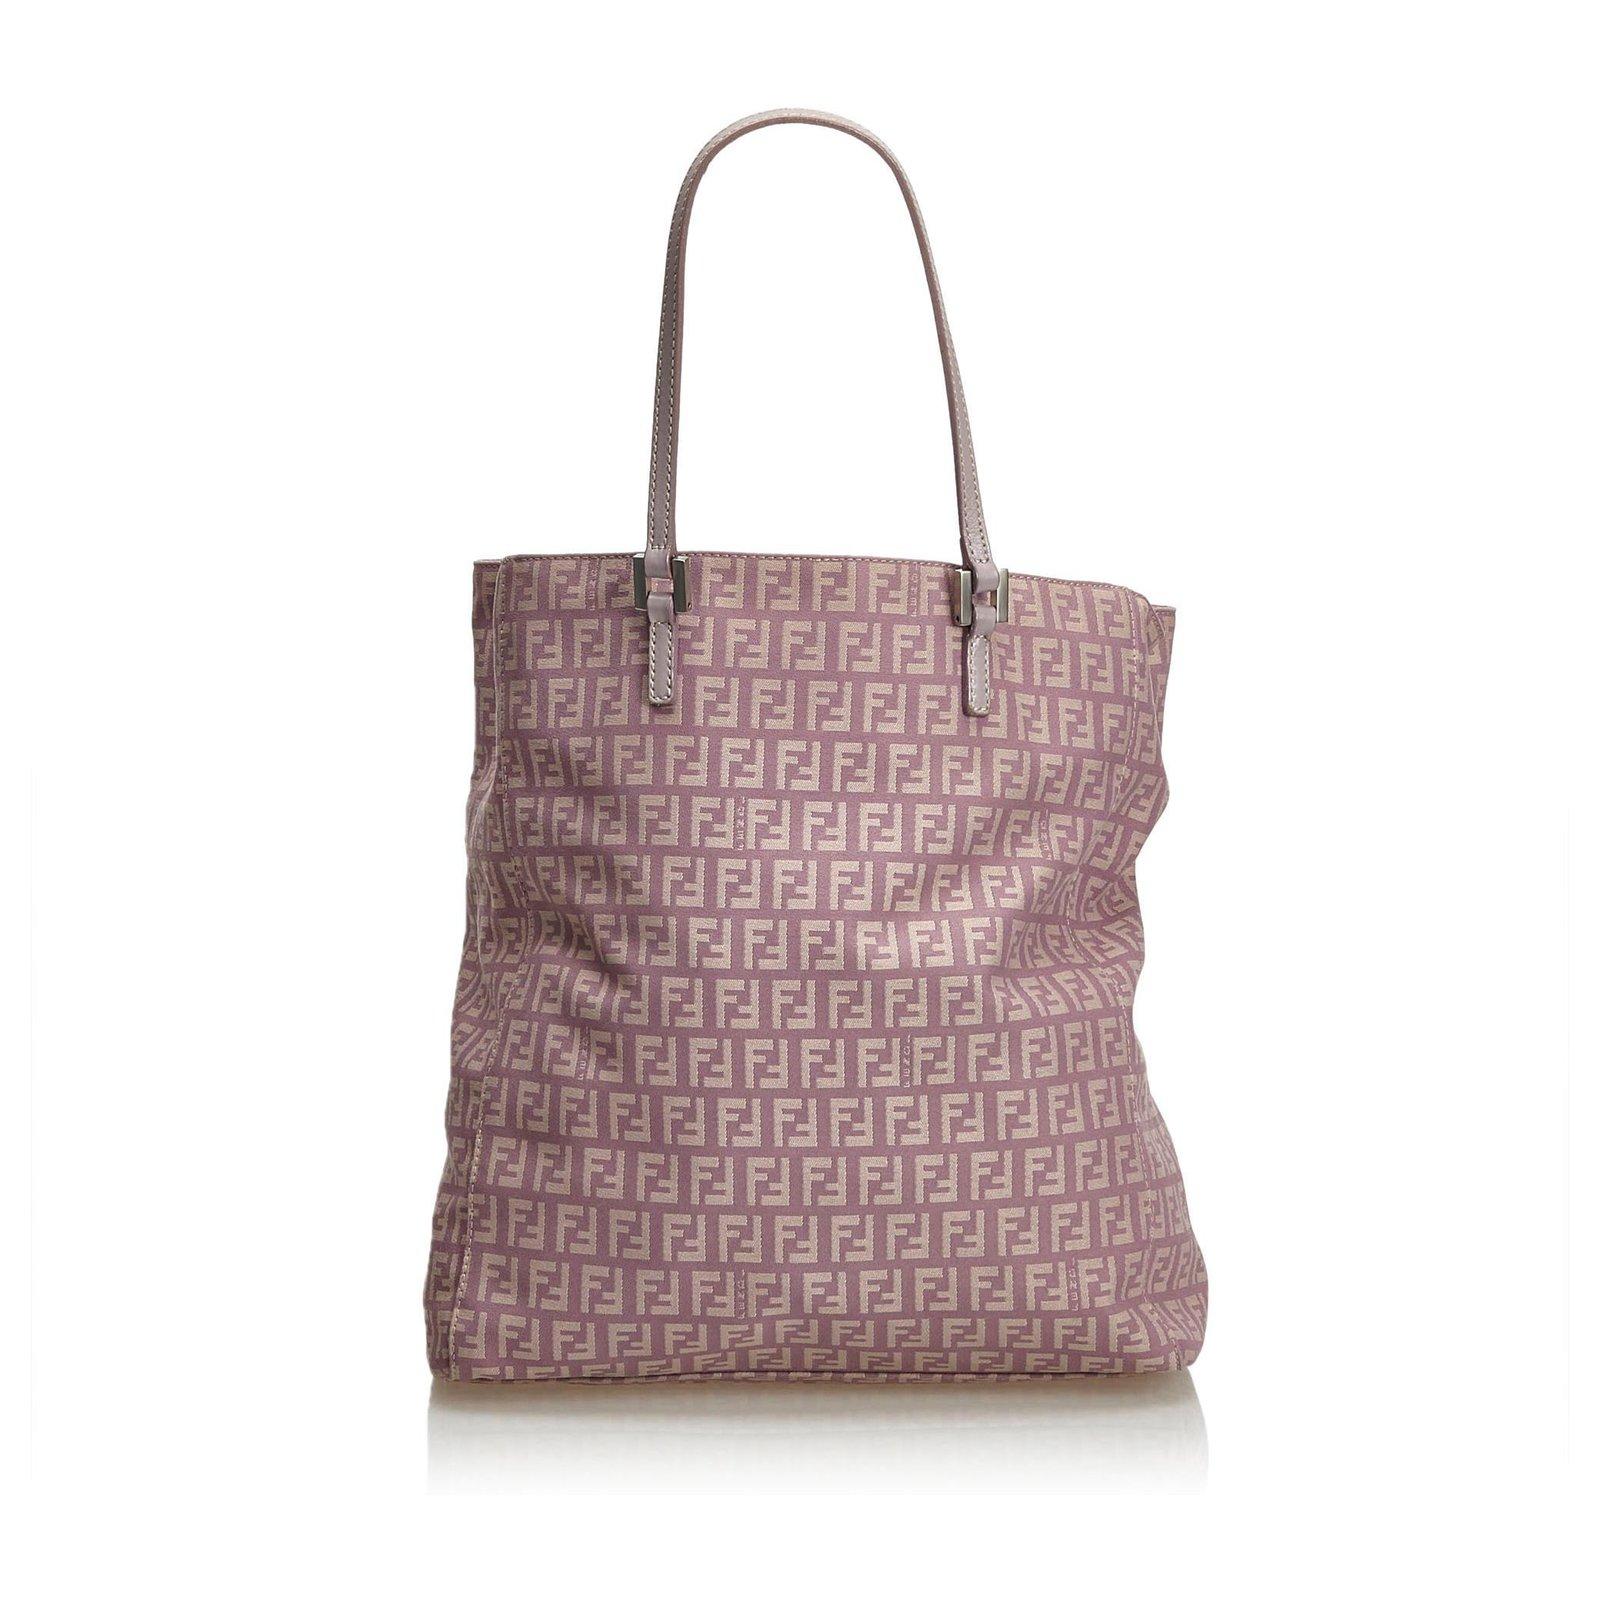 7368ea3a06cae Fendi Zucchino Jacquard Tote Bag Totes Leather